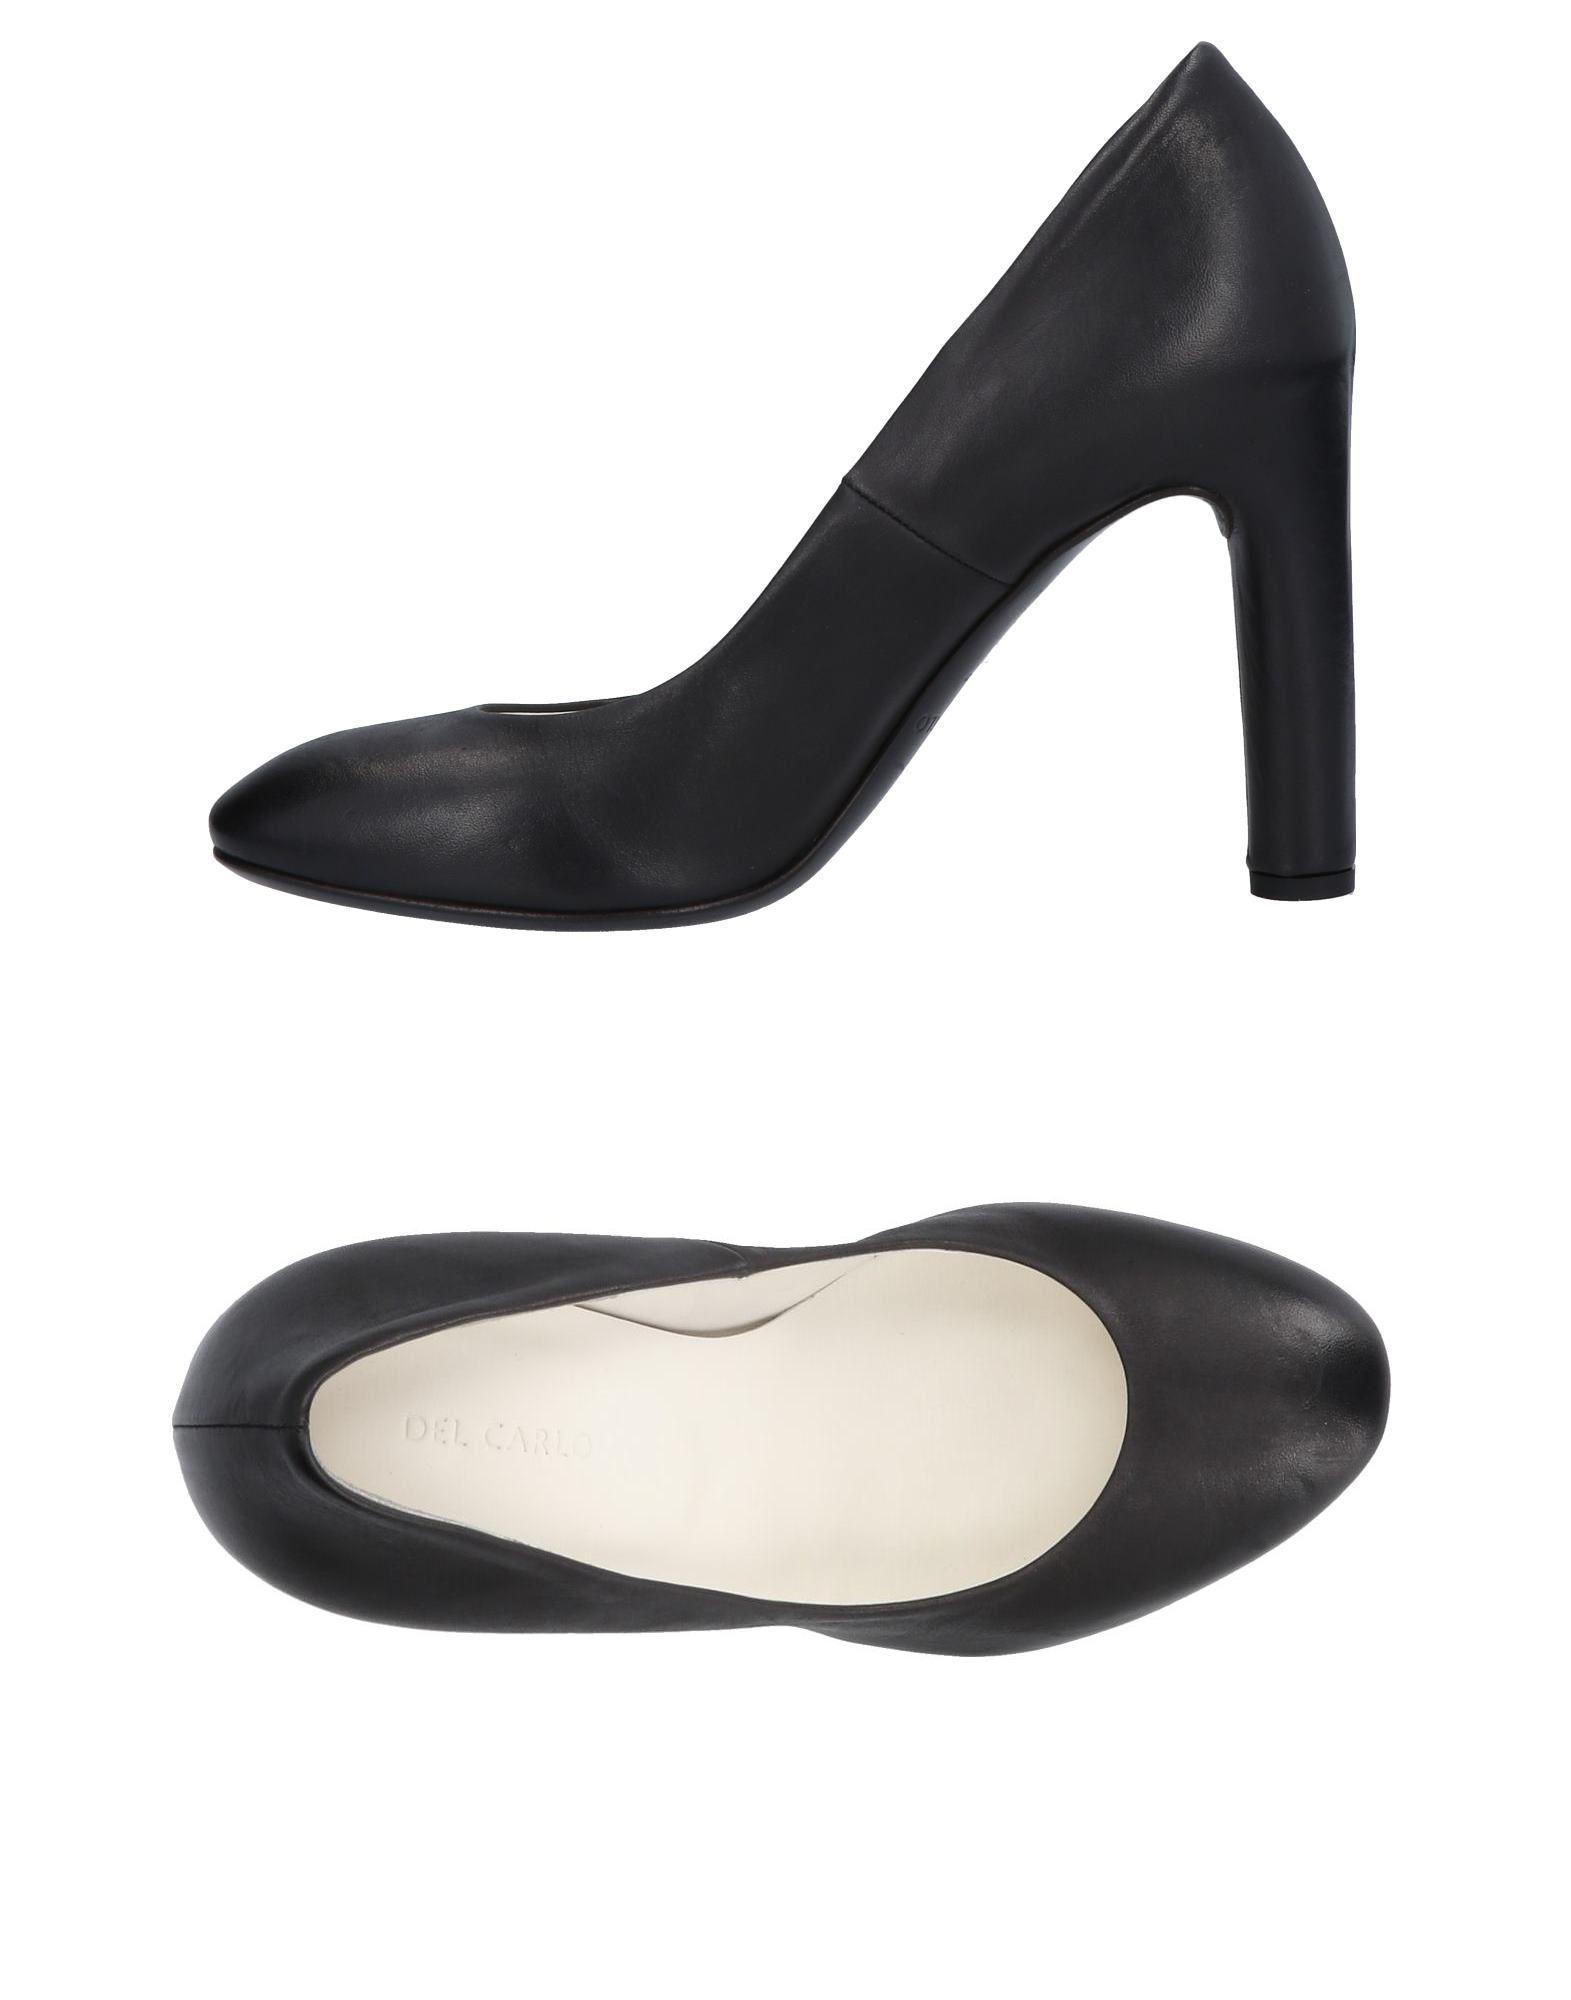 Del Carlo Pumps Damen  11489303PBGut aussehende strapazierfähige Schuhe